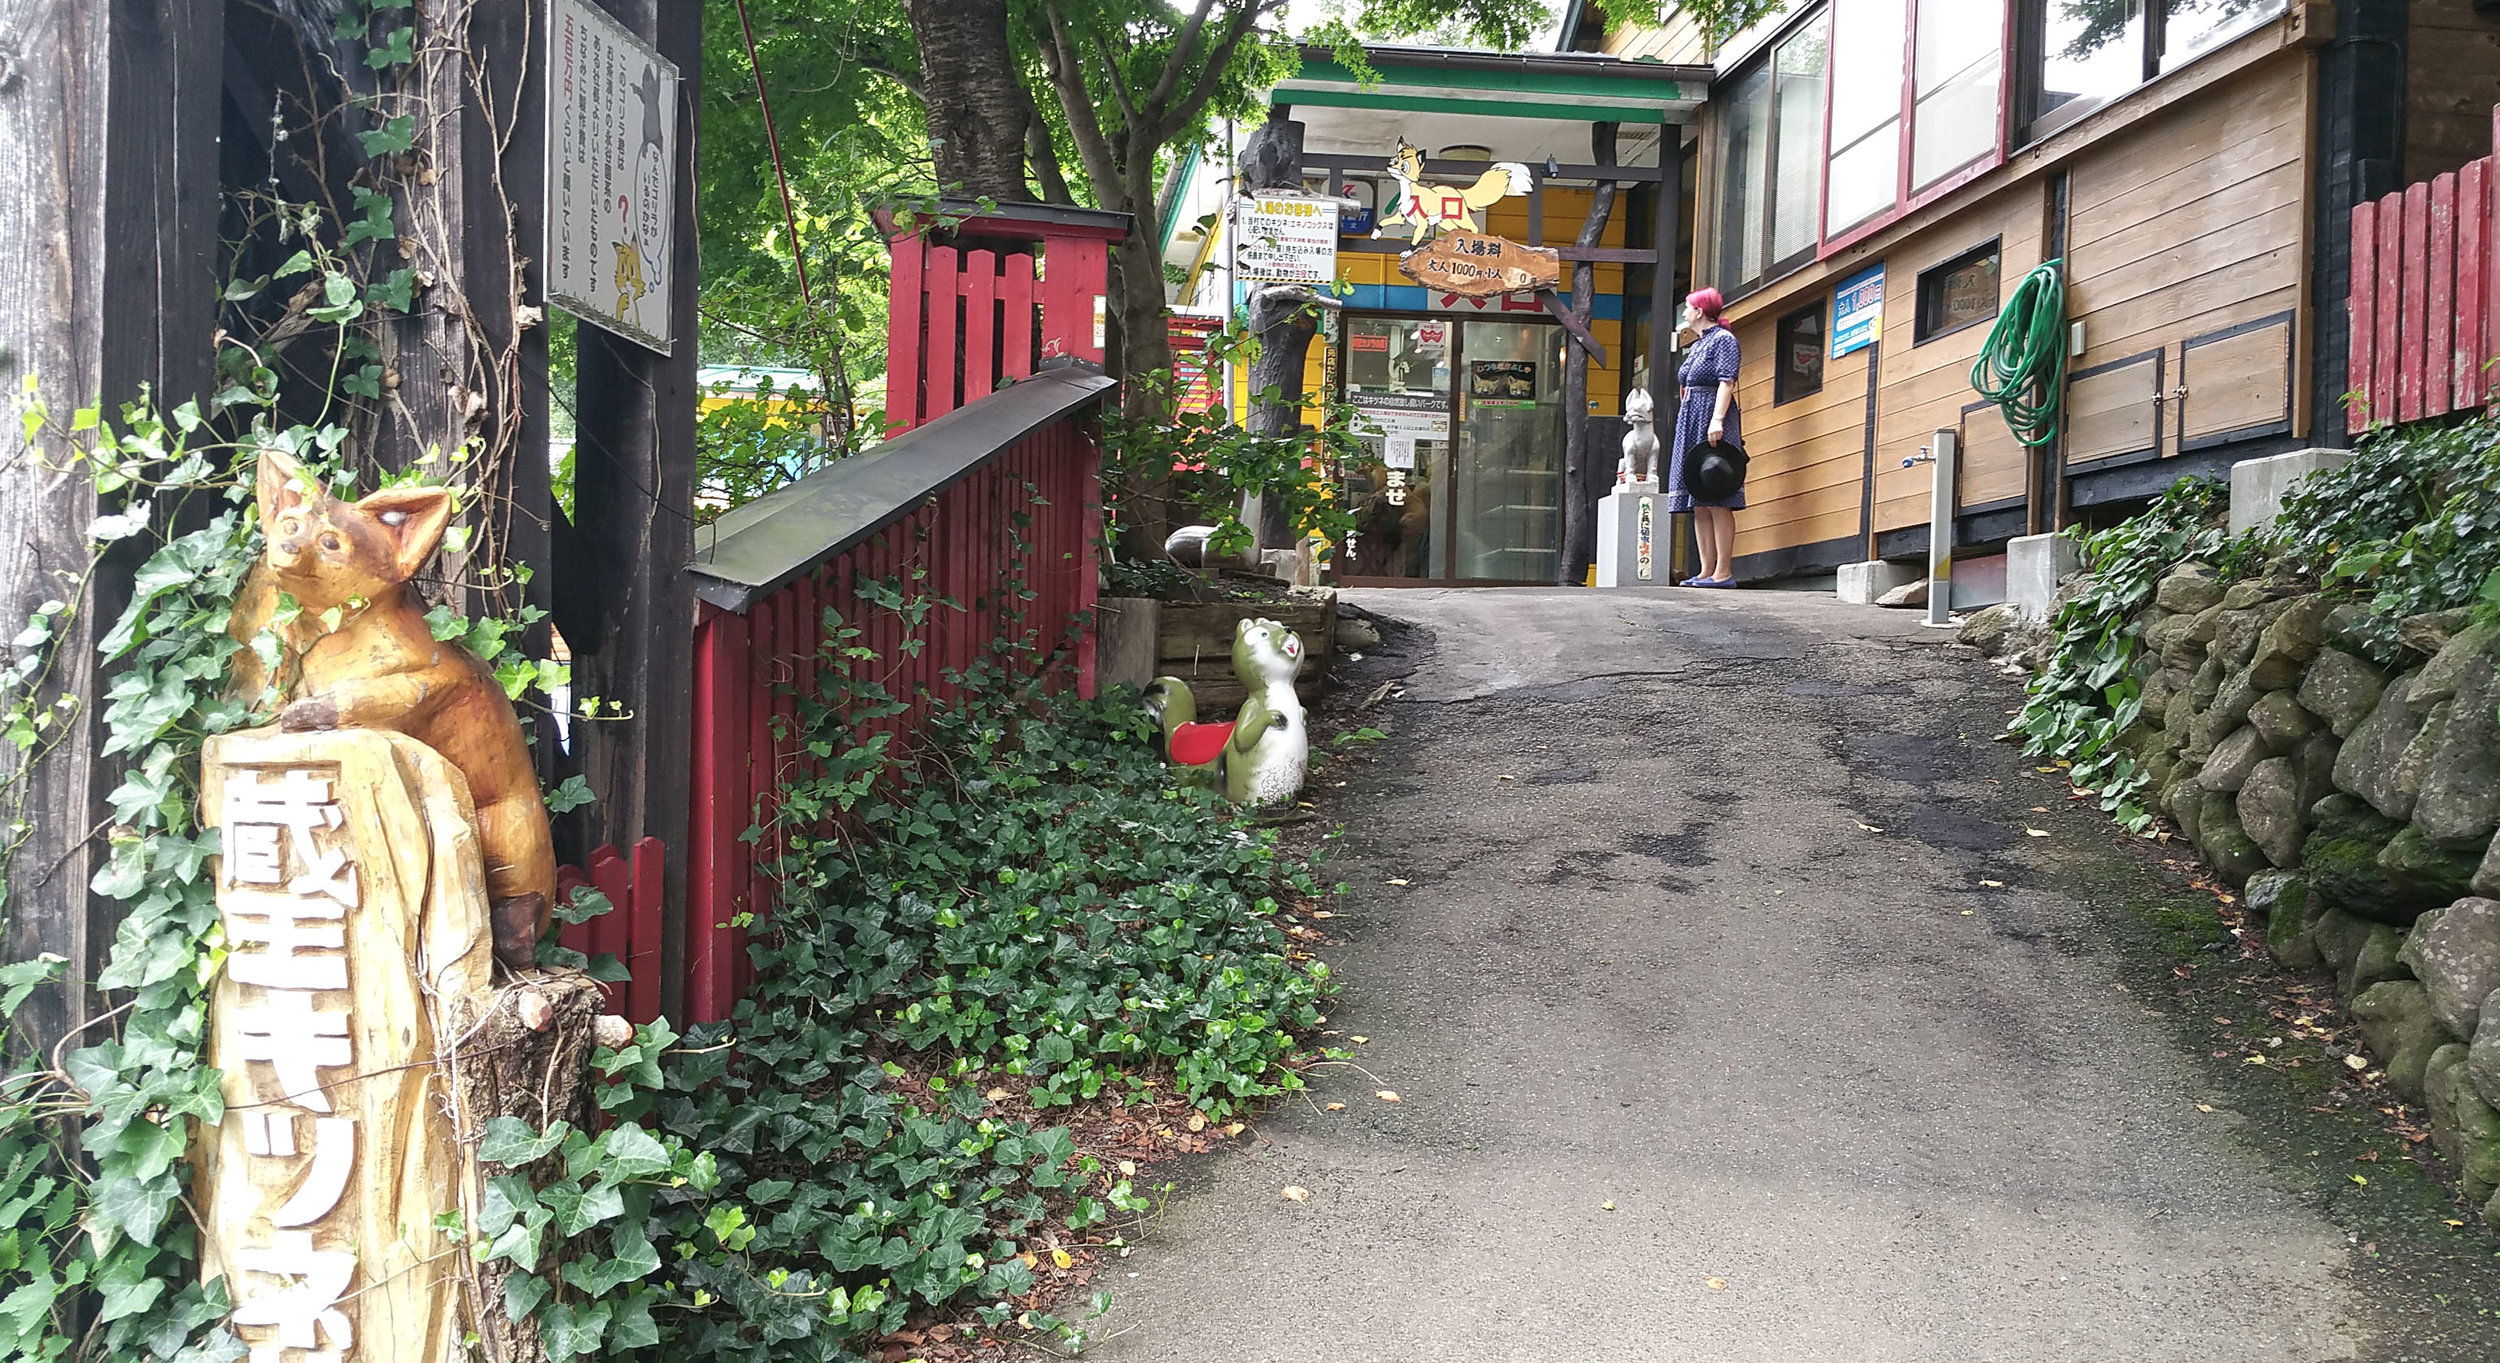 Zao-Fox-Village-Bunny-Entrance.jpg